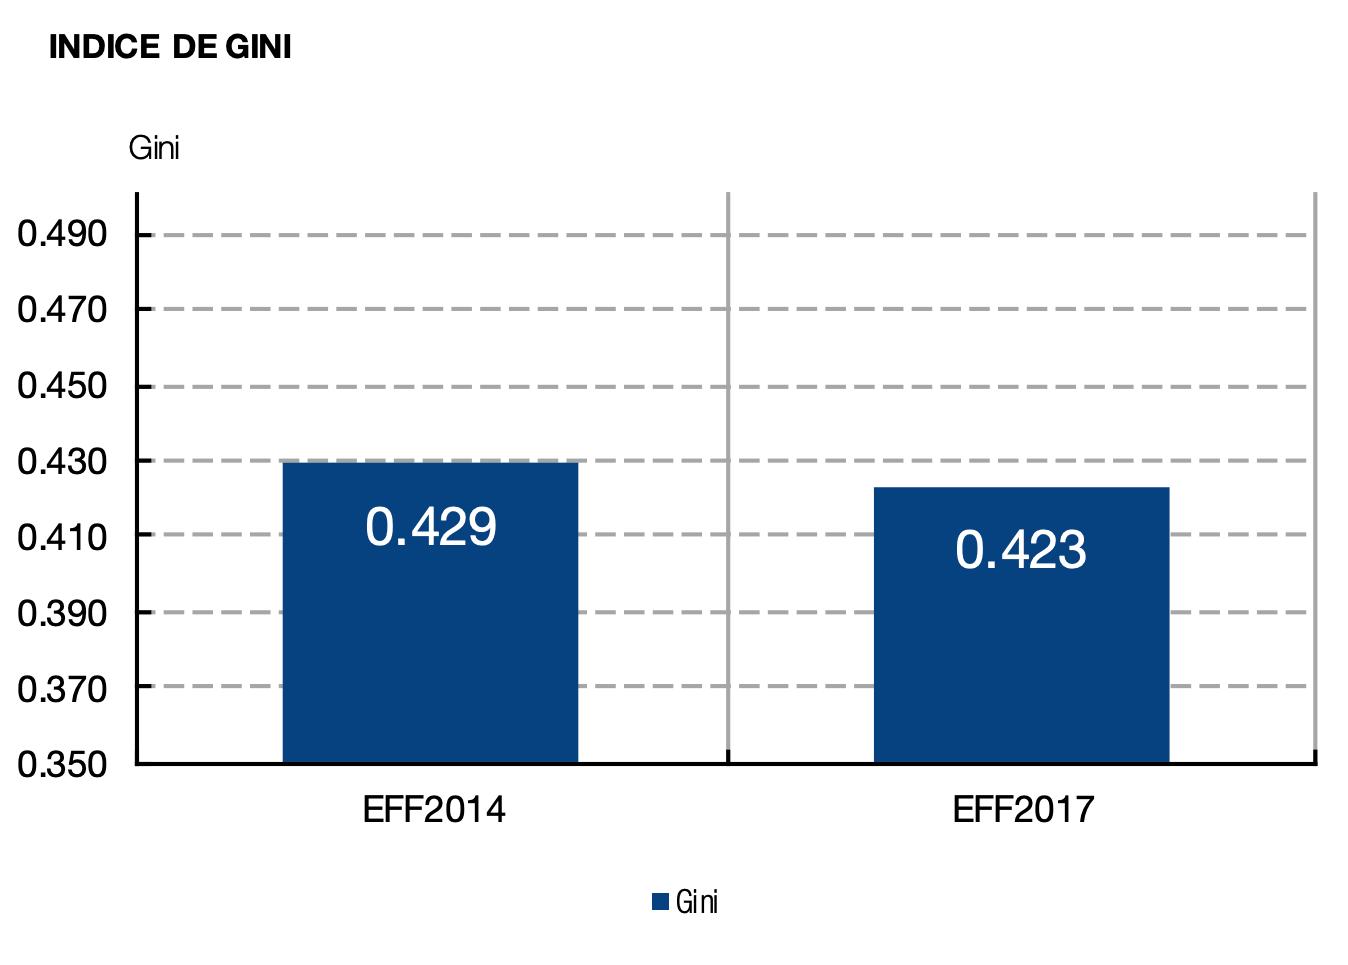 2-desigualdad-espana-indice-de-gini-2014